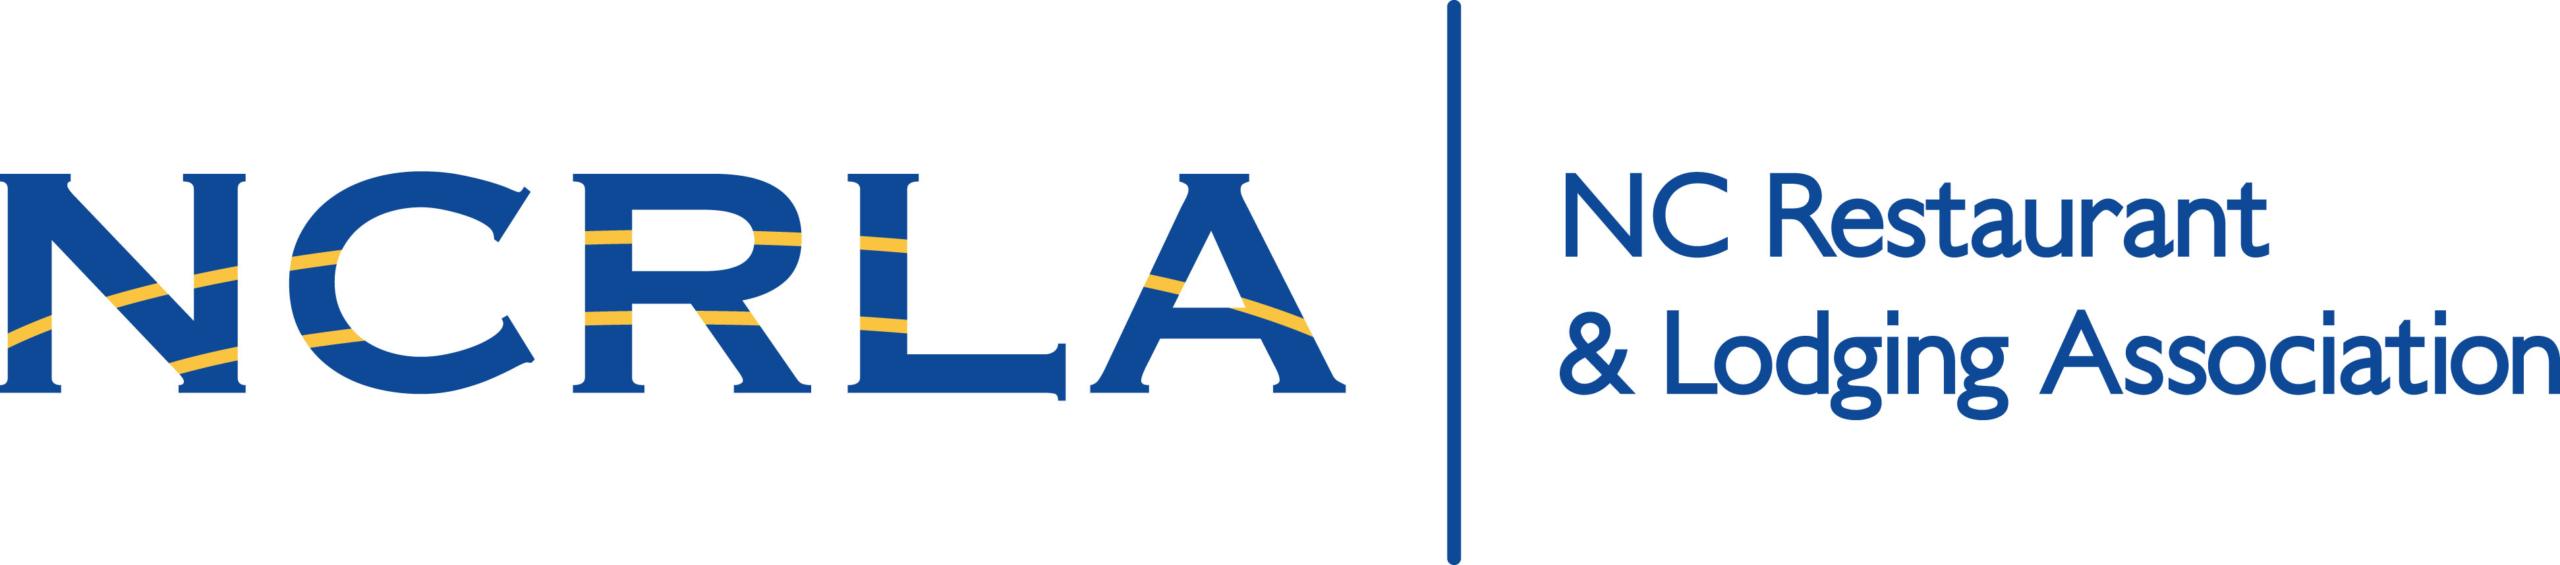 2013_highres_NCRLA_Logo